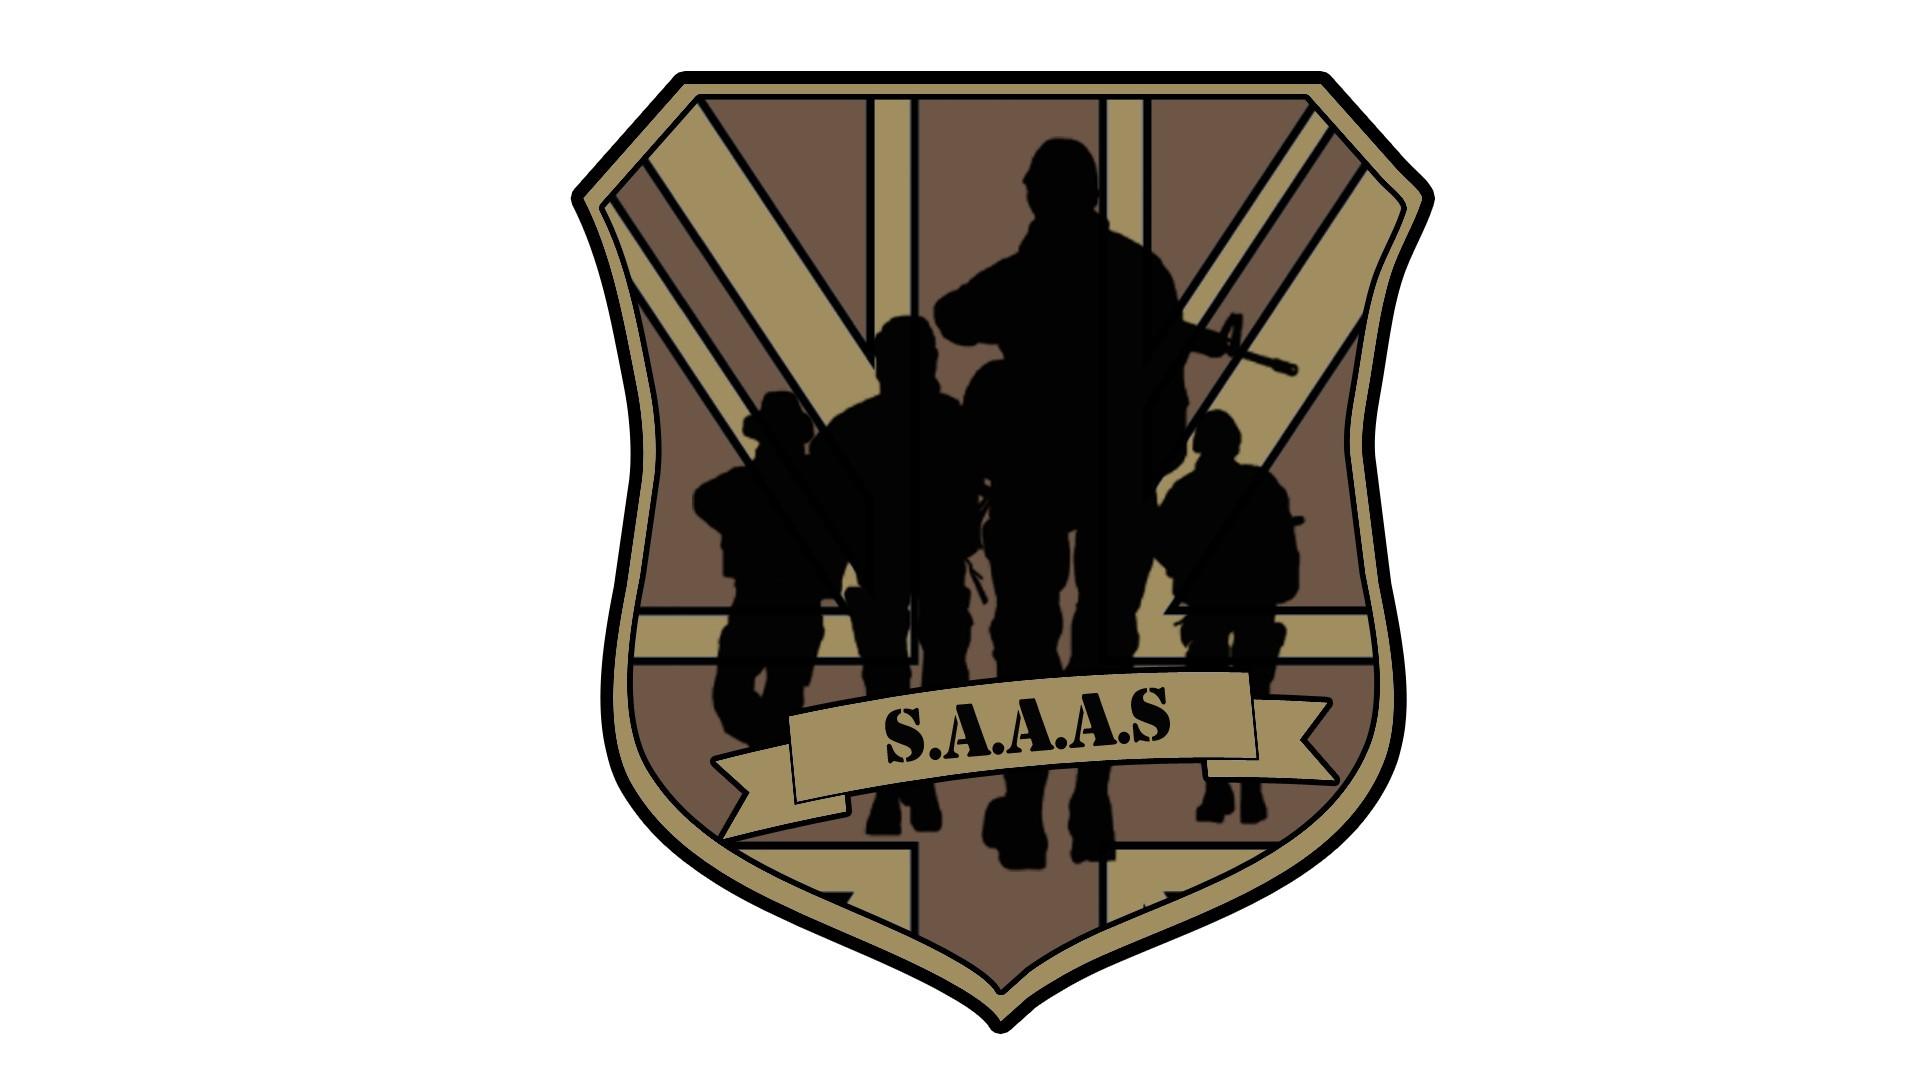 SAAAS